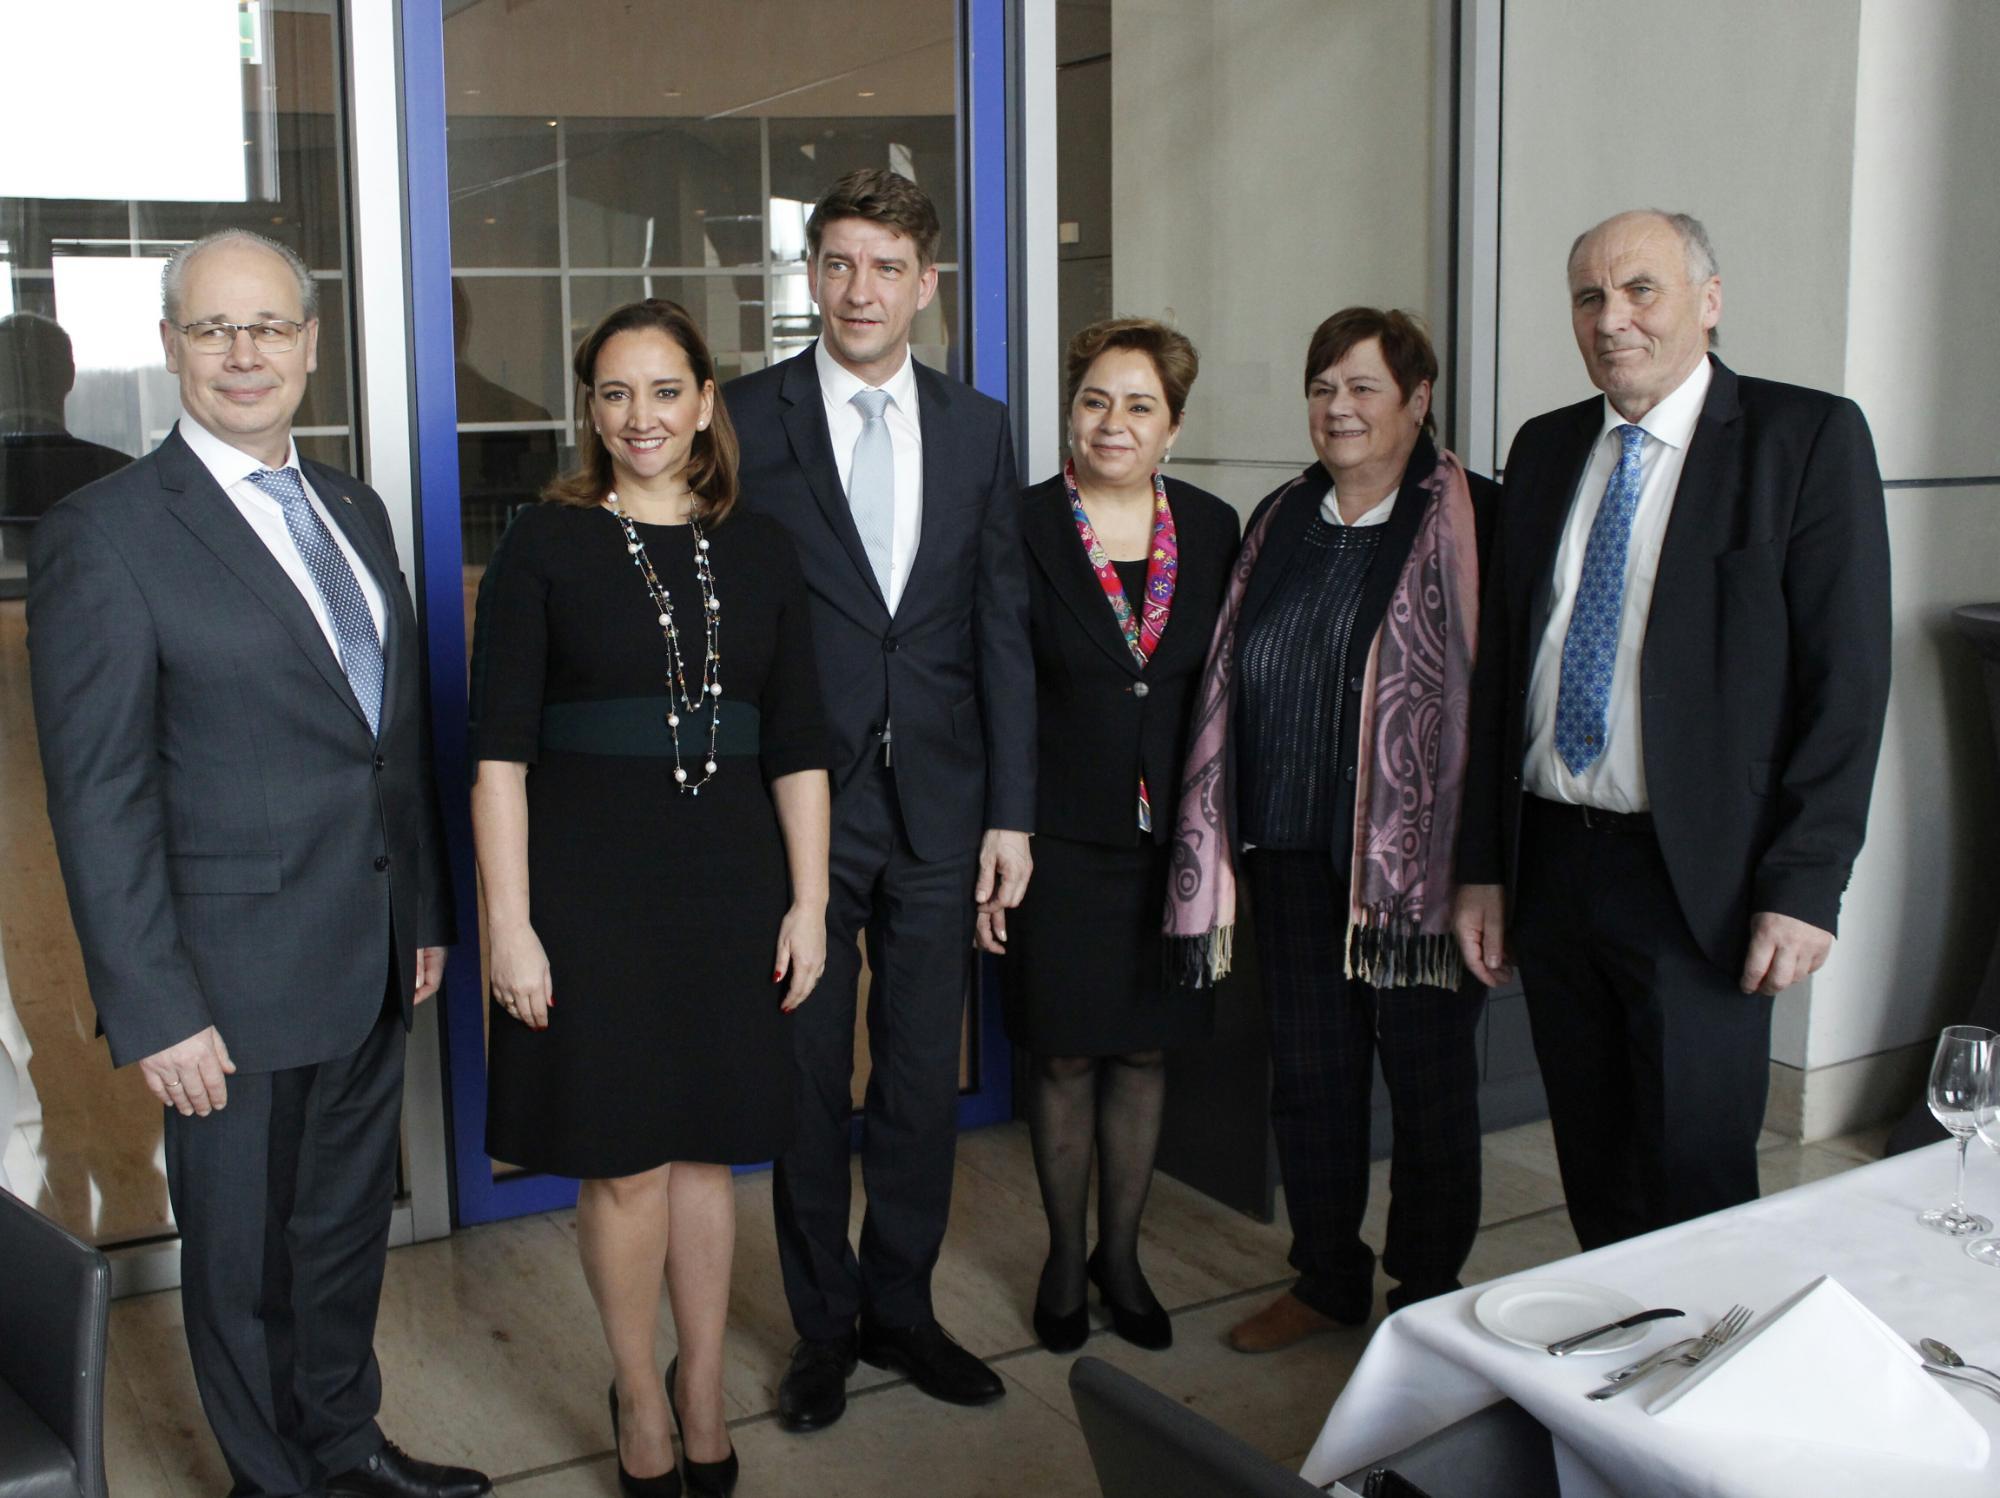 FOTO 6 Canciller Claudia Ruiz Massieu se reuni  con Diputados del Parlamento Federal de Alemania.jpg